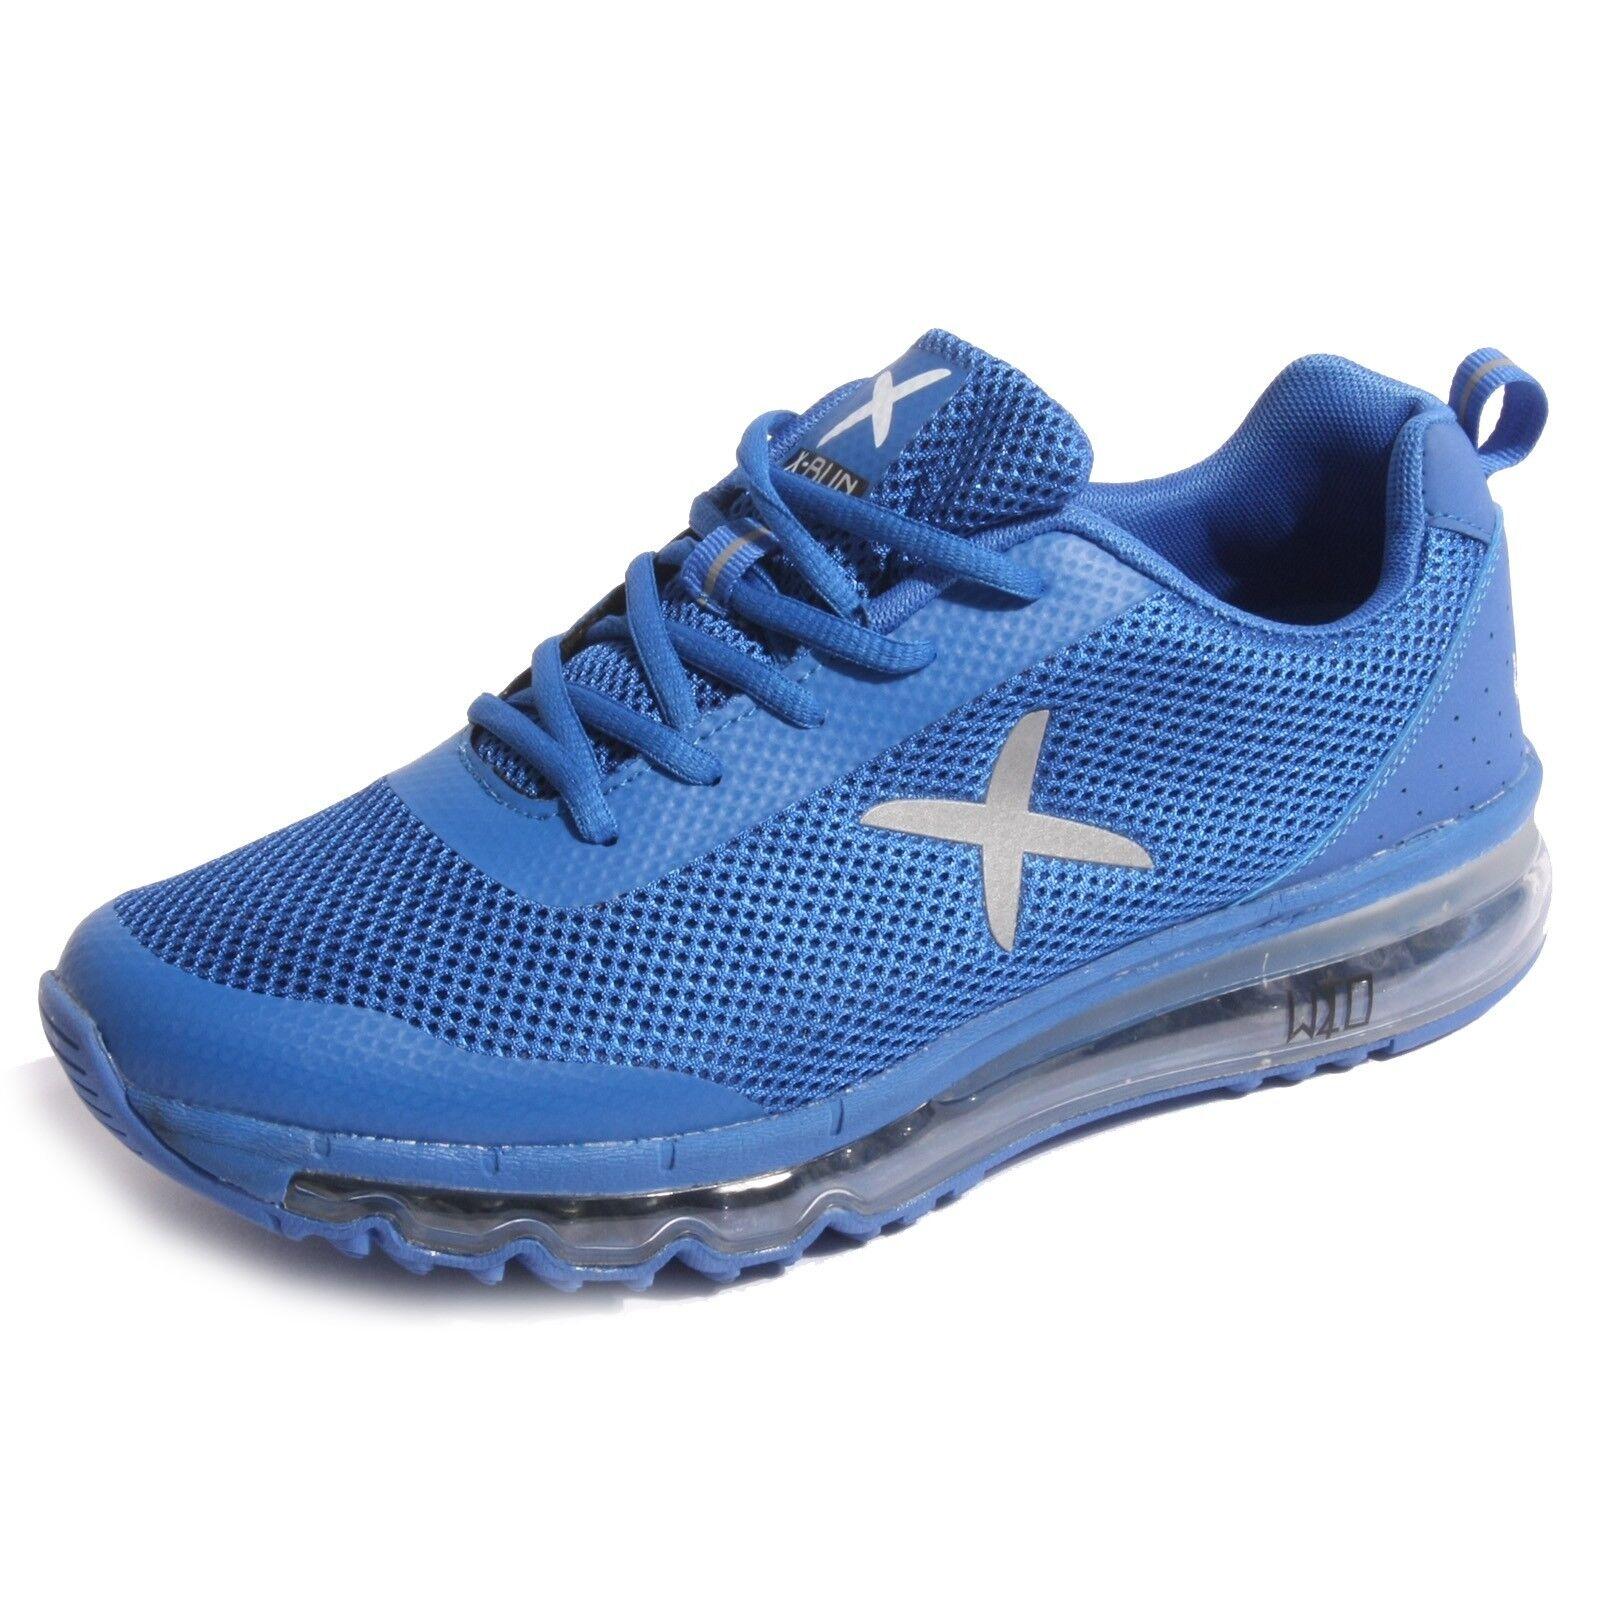 B0501 sneaker hombre WIZE Zapatos & OPE X-RUN zapato blu Zapatos WIZE hombre a23873